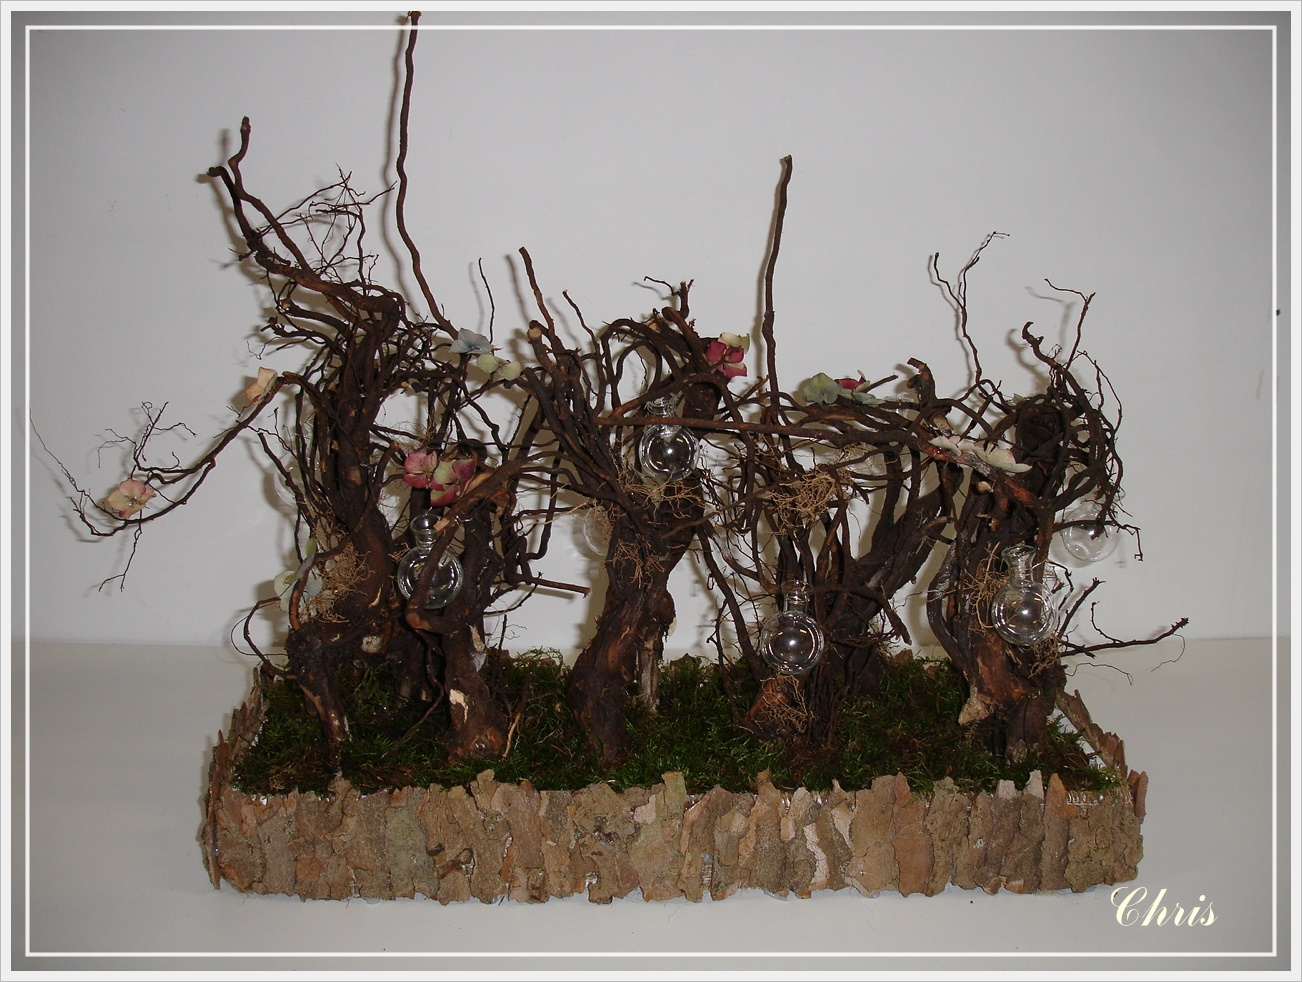 Rozen   kant en lavendel: bloemenboom